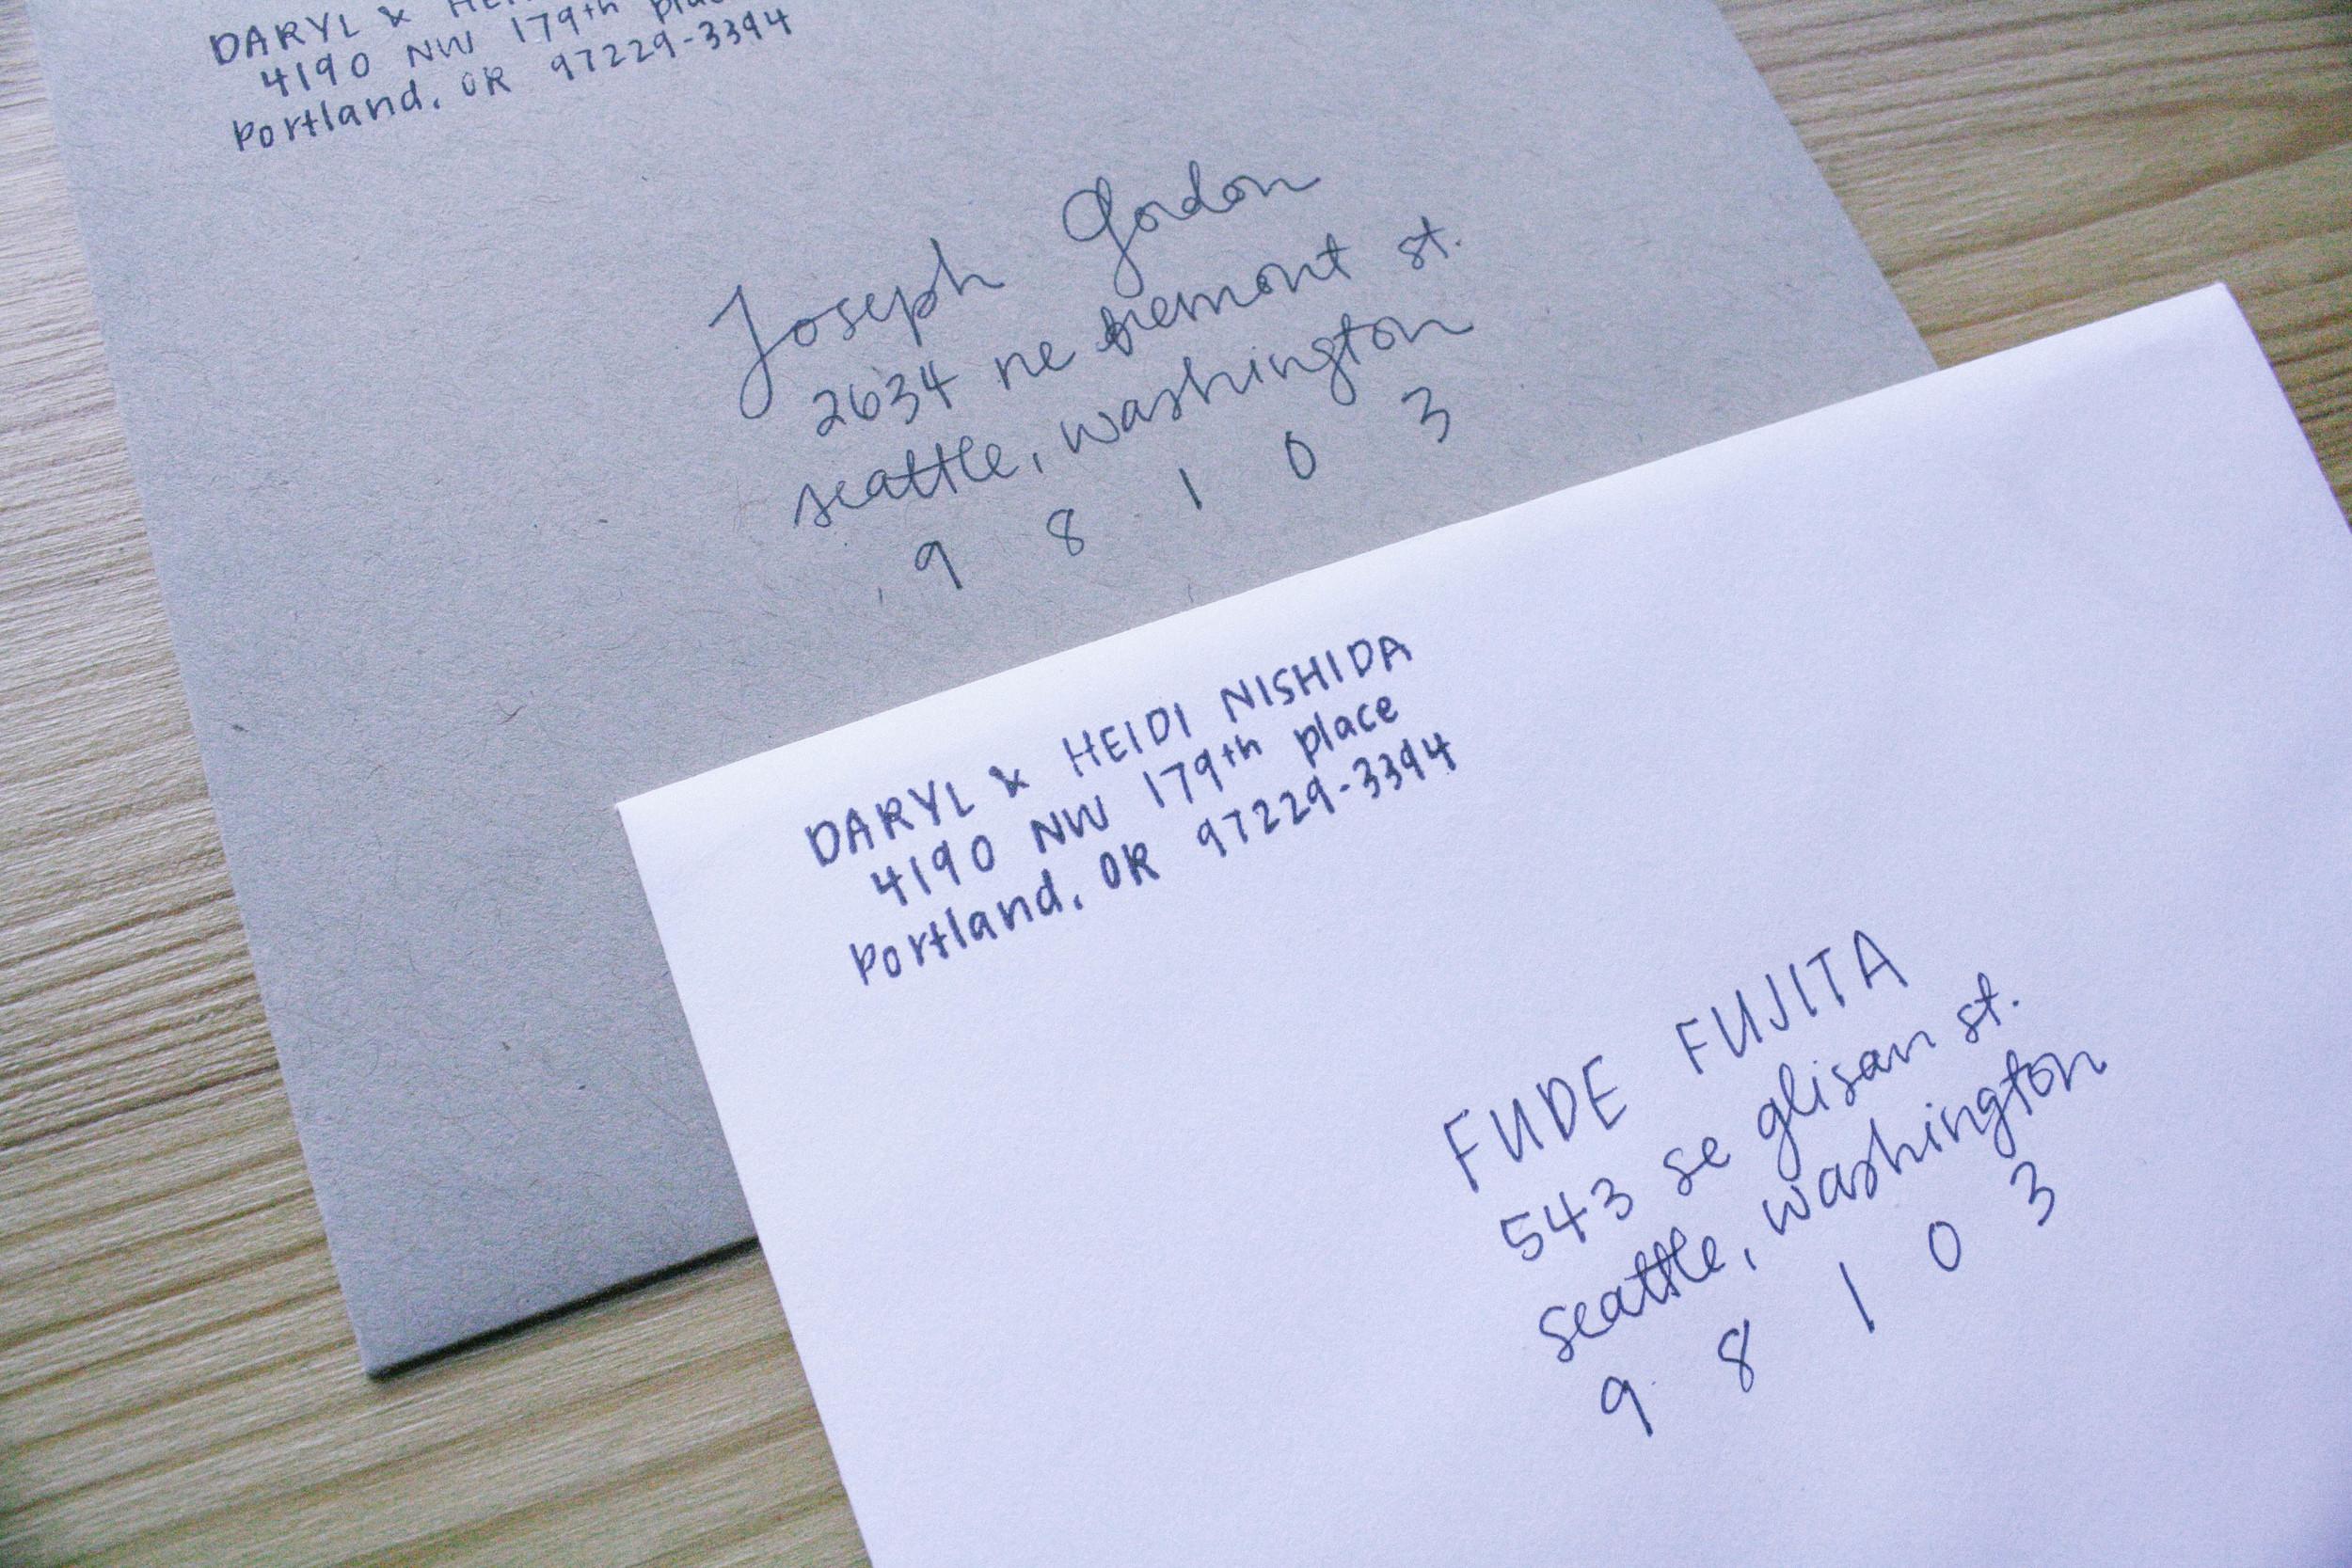 custom-adddress-stamp-by-everglow-handmade-9